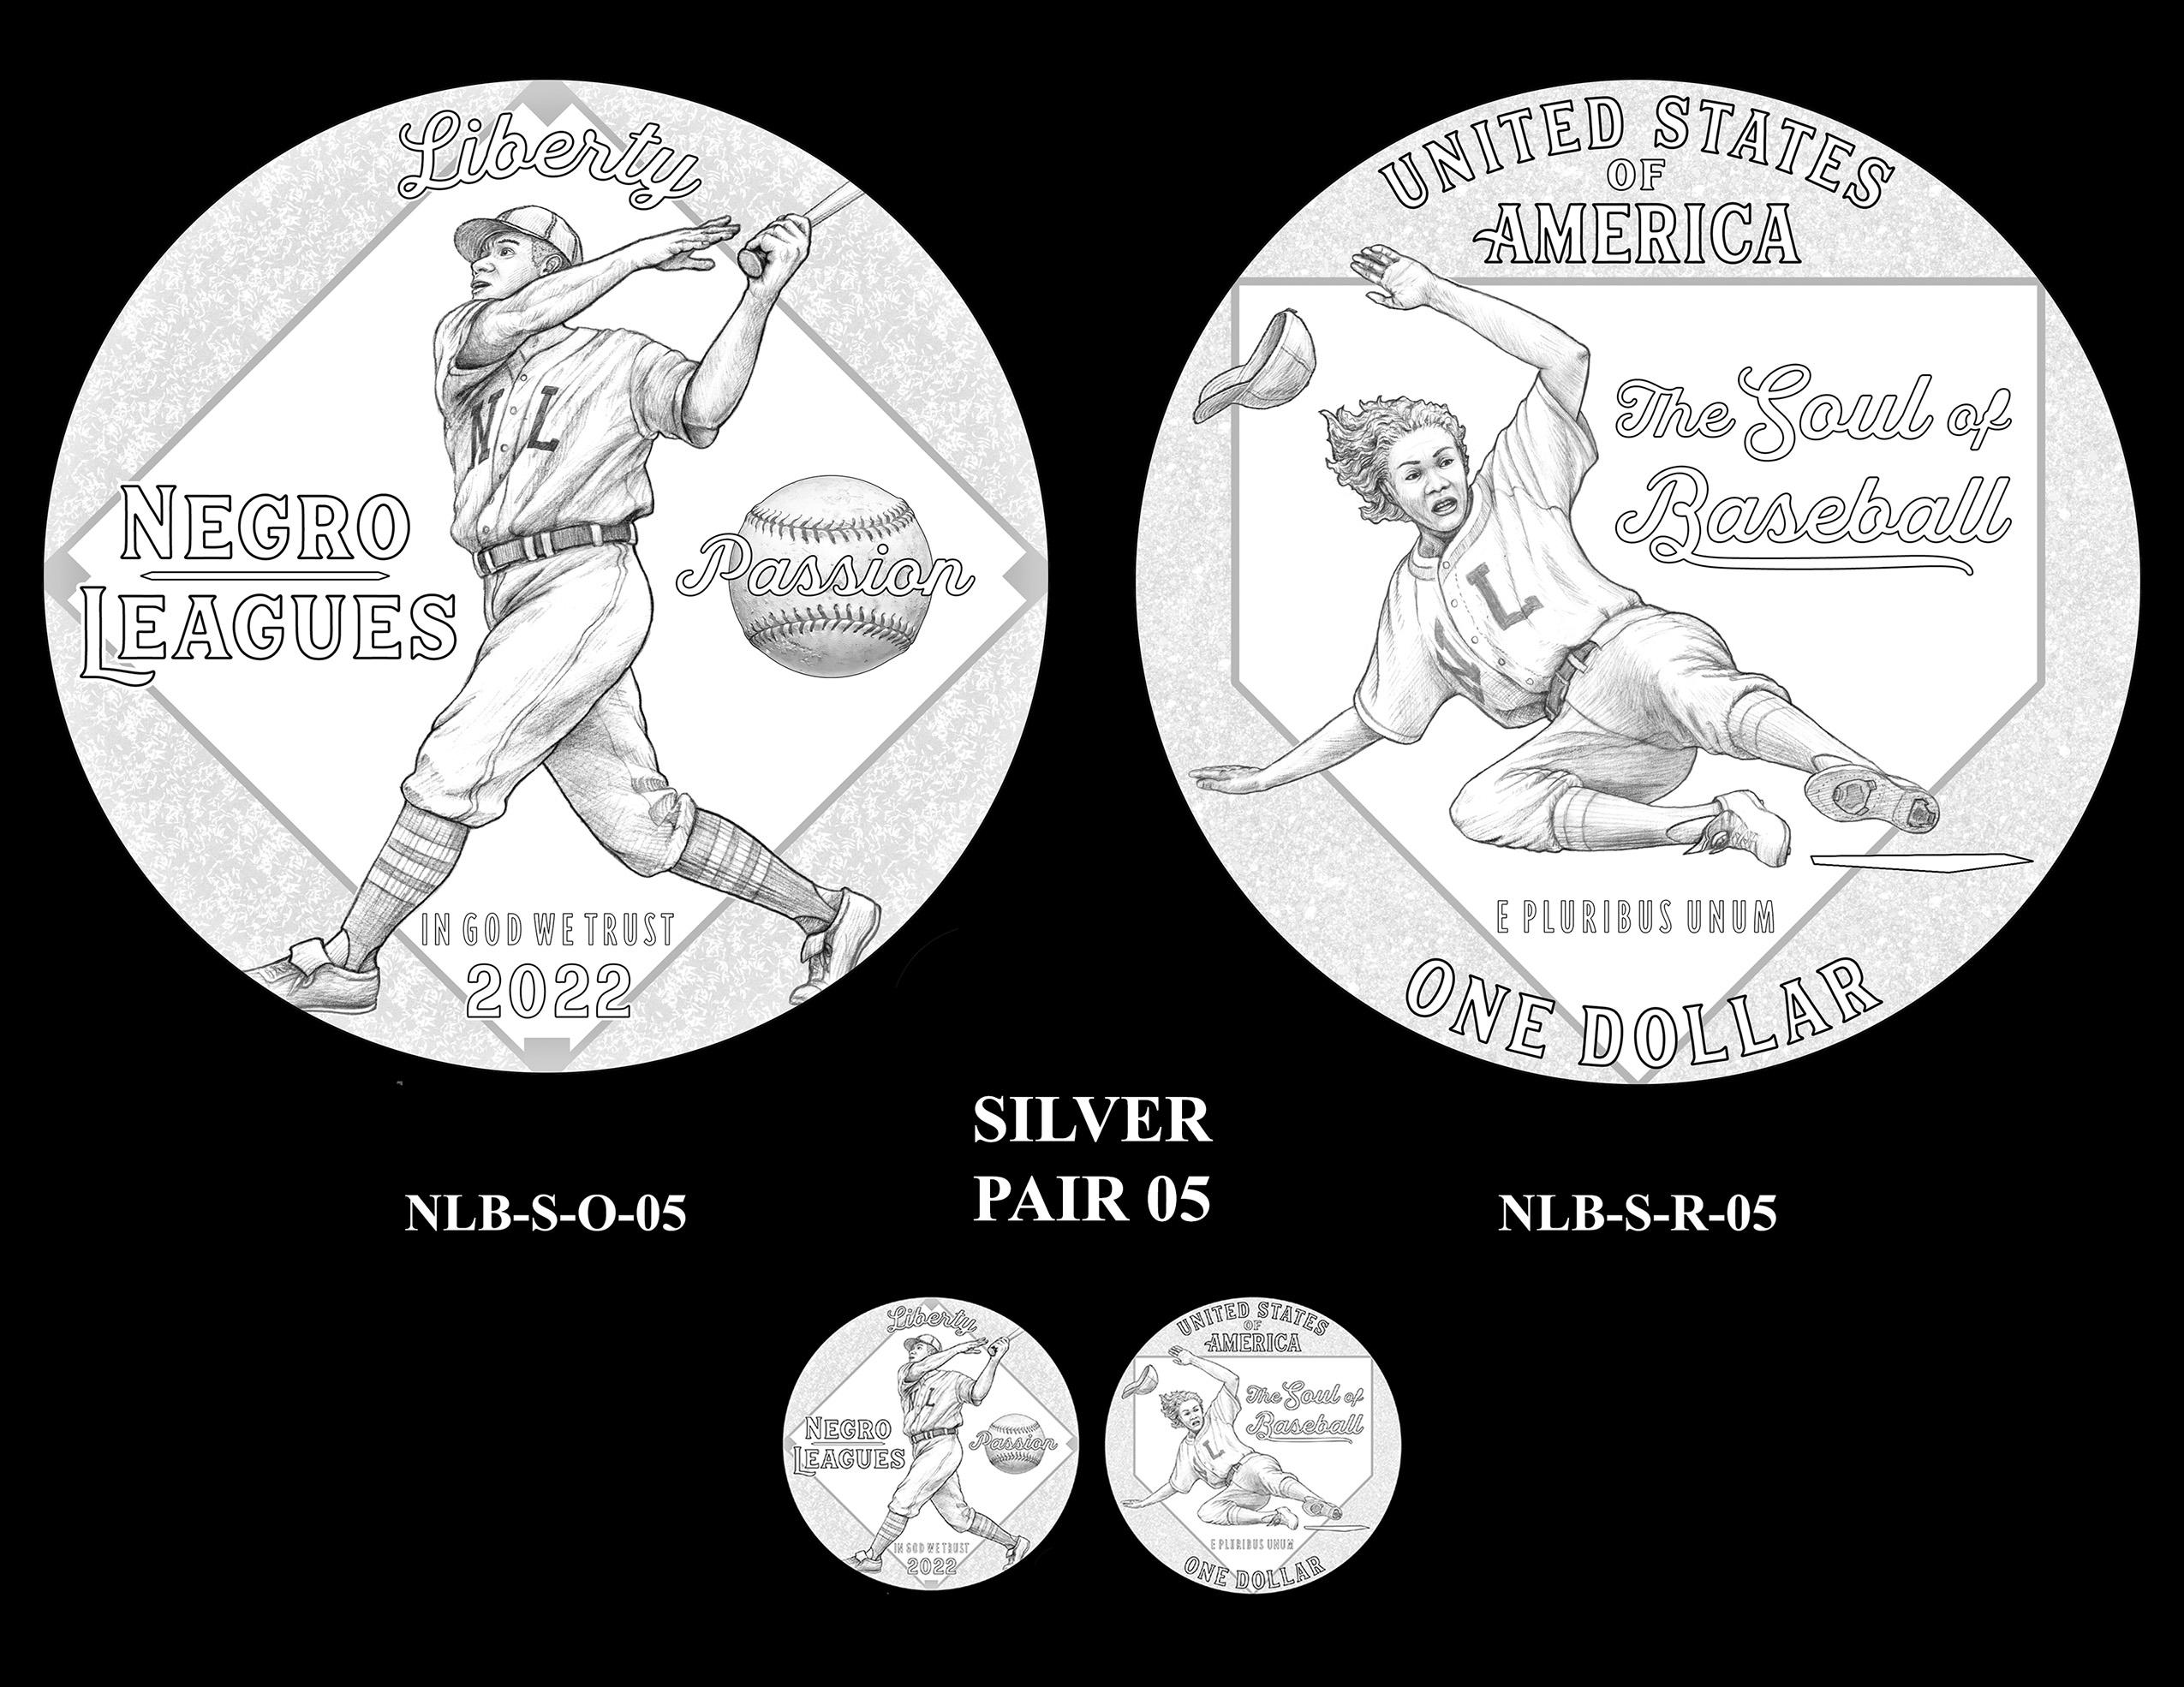 Silver Pair 05 -- Negro Leagues Baseball Commemorative Coin Program